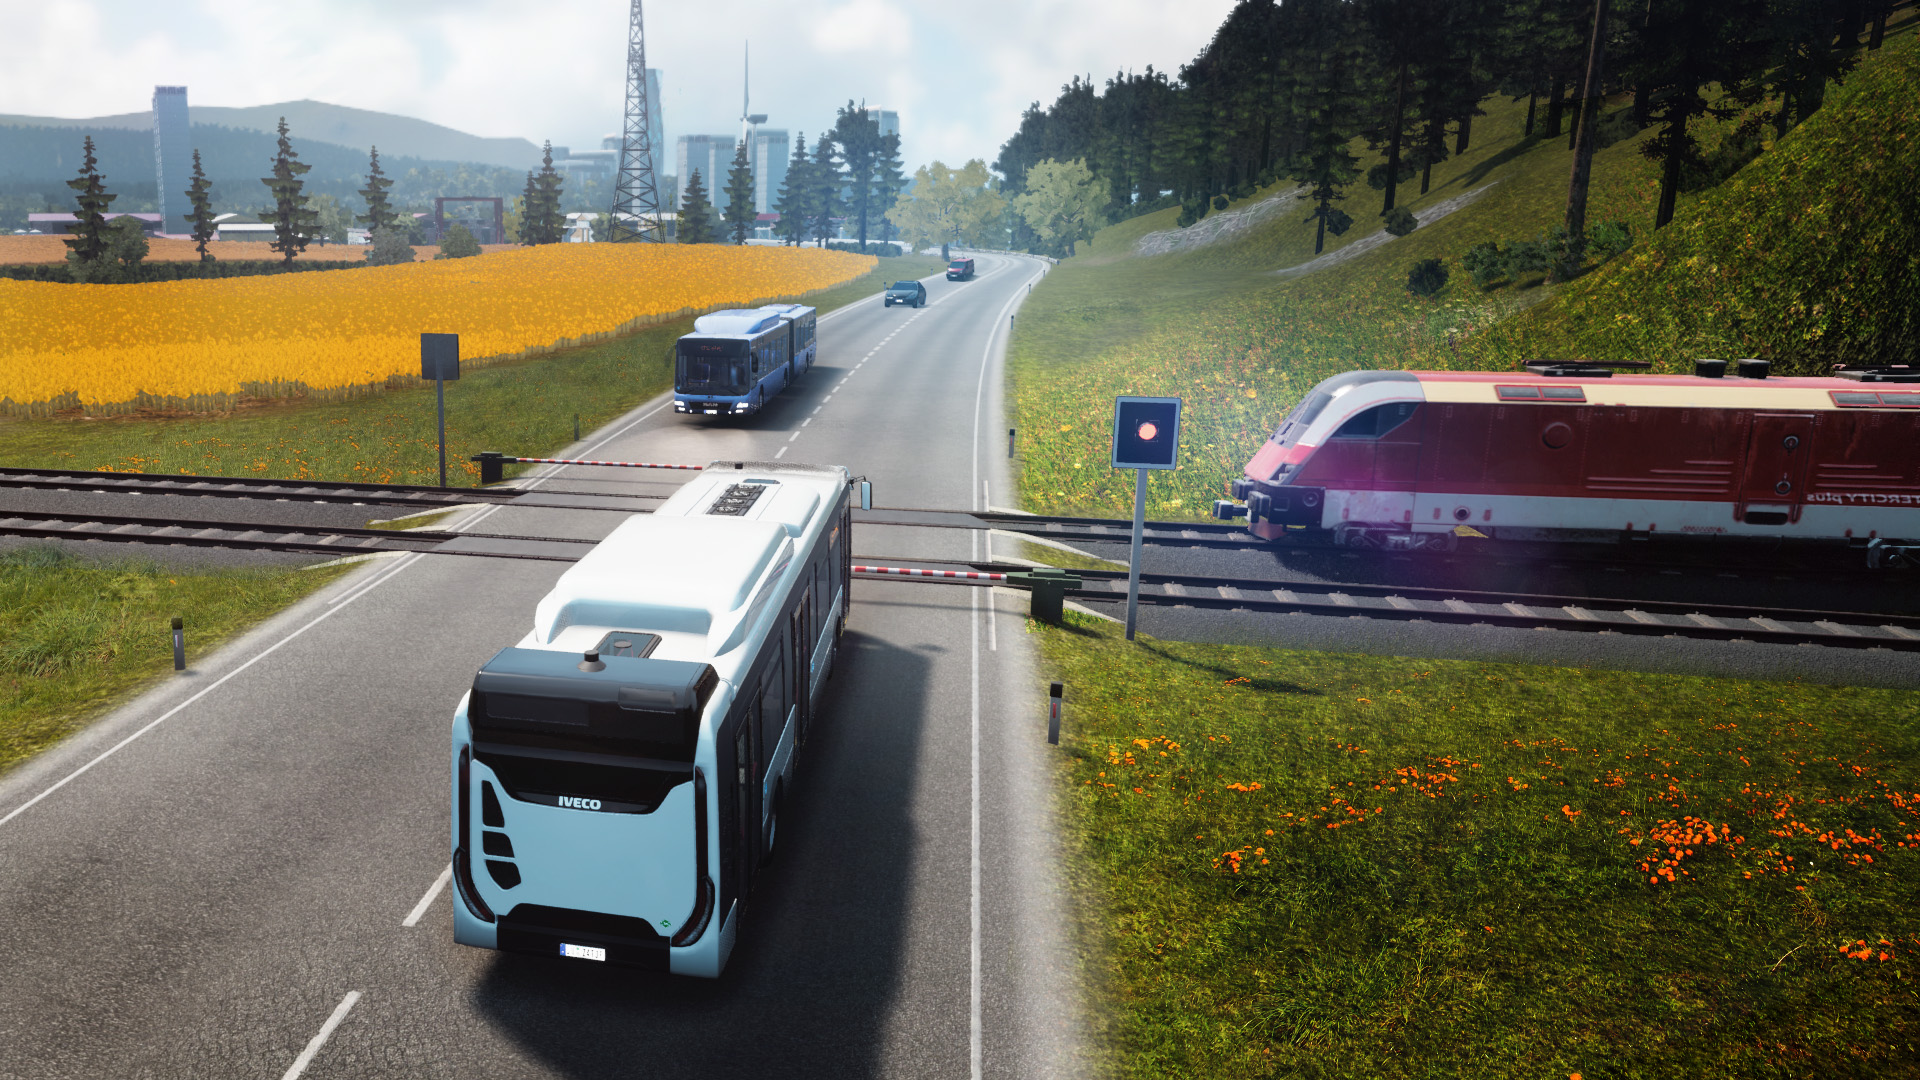 bus driver game free download utorrent